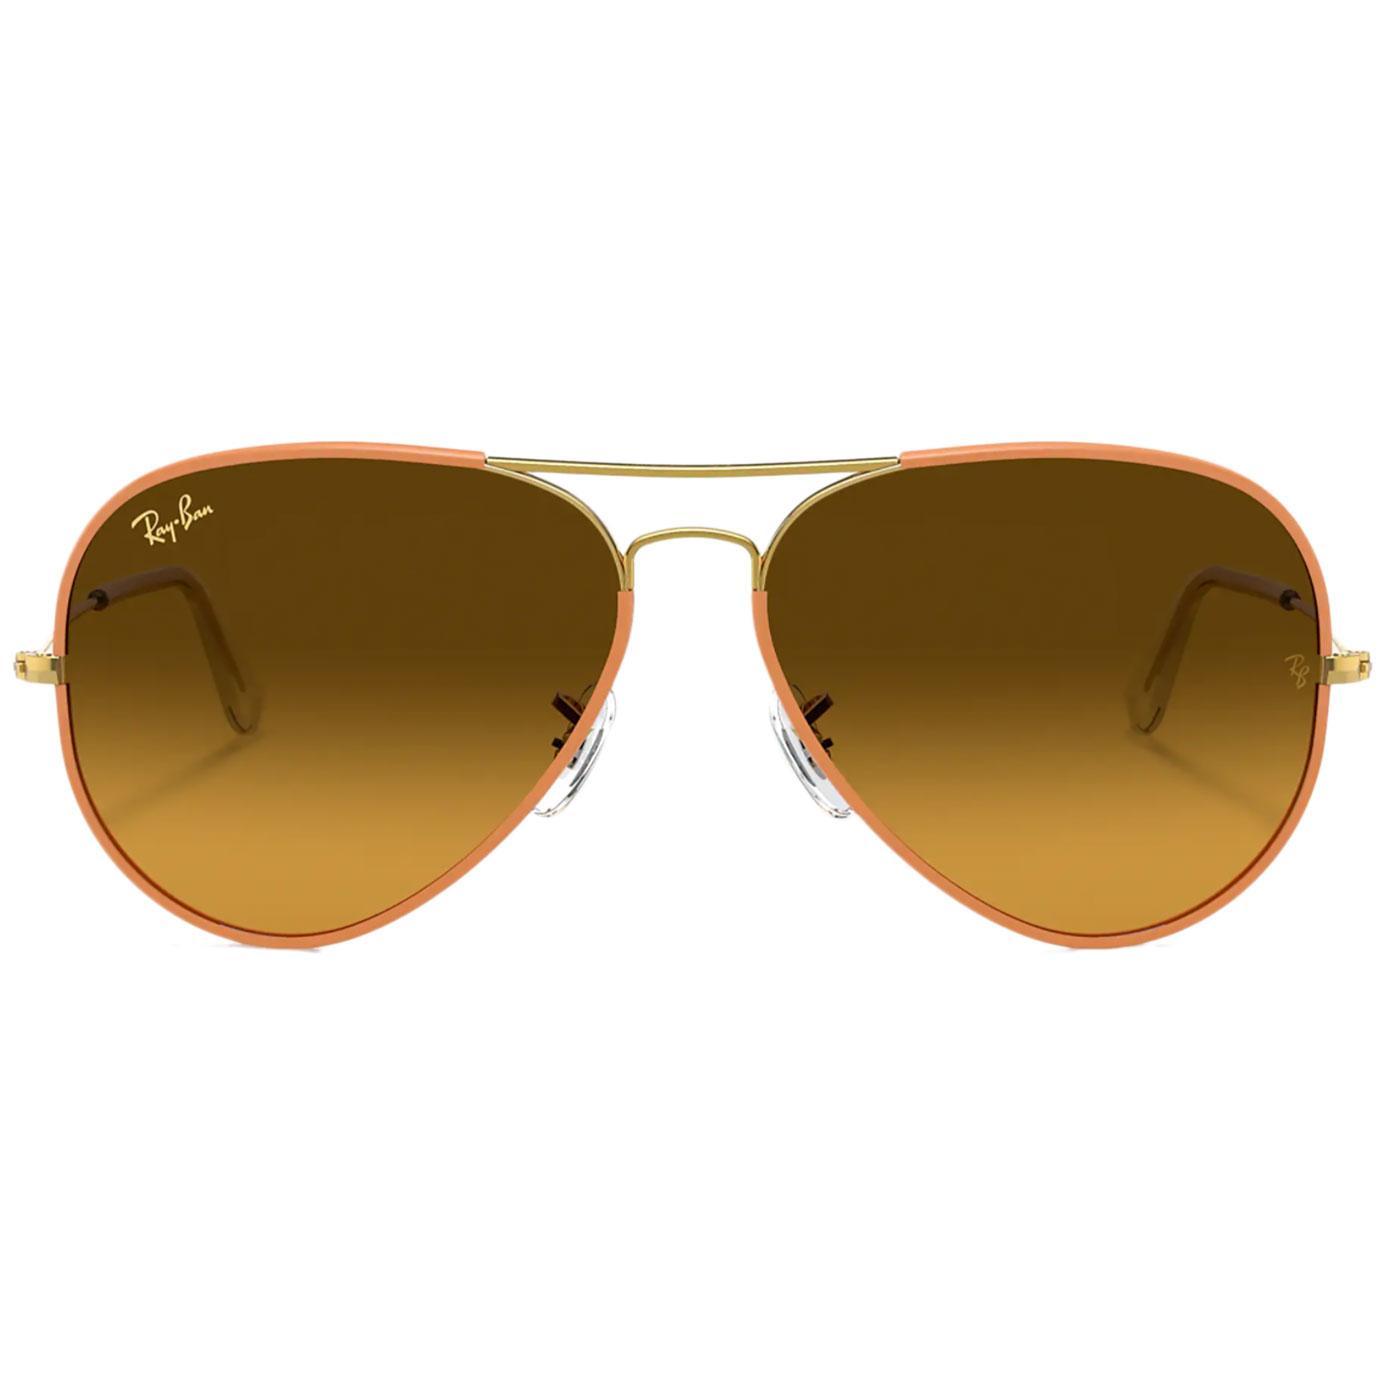 Aviator Full Colour RAY-BAN Retro 70s Sunglasses O